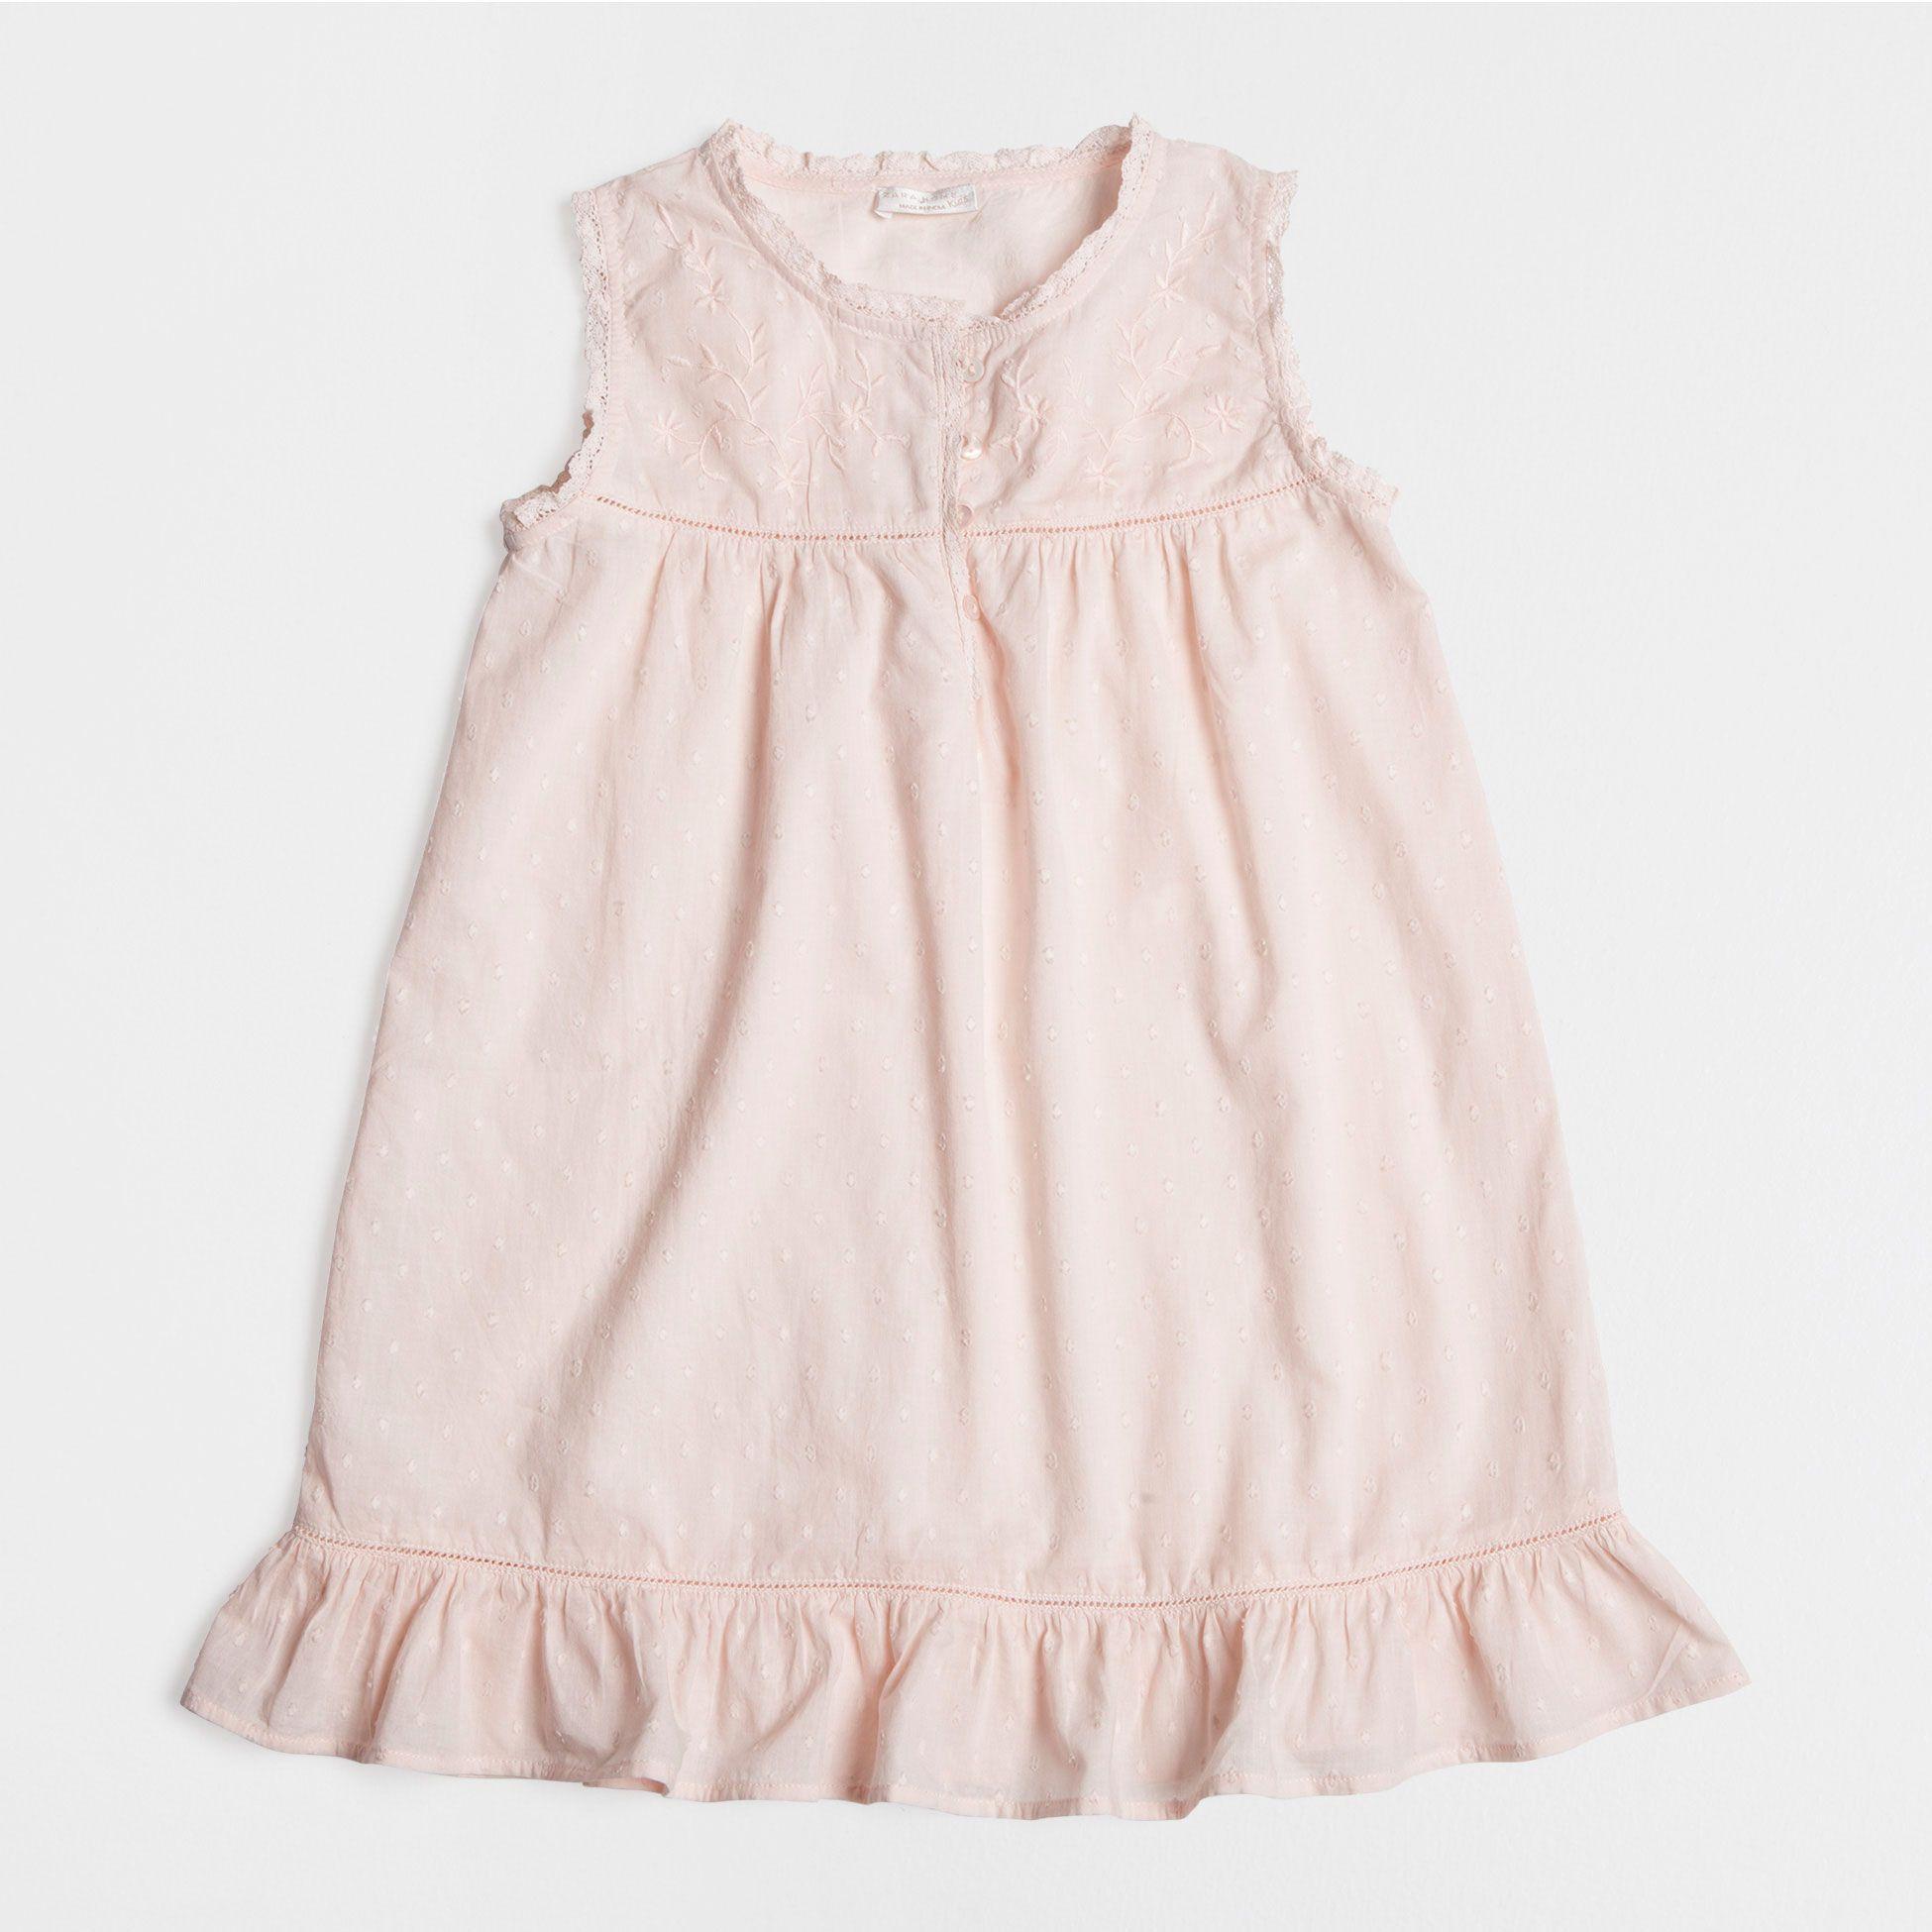 19a89b12 Embroidered Cotton Nightdress - Kids - Homewear | Zara Home United Kingdom